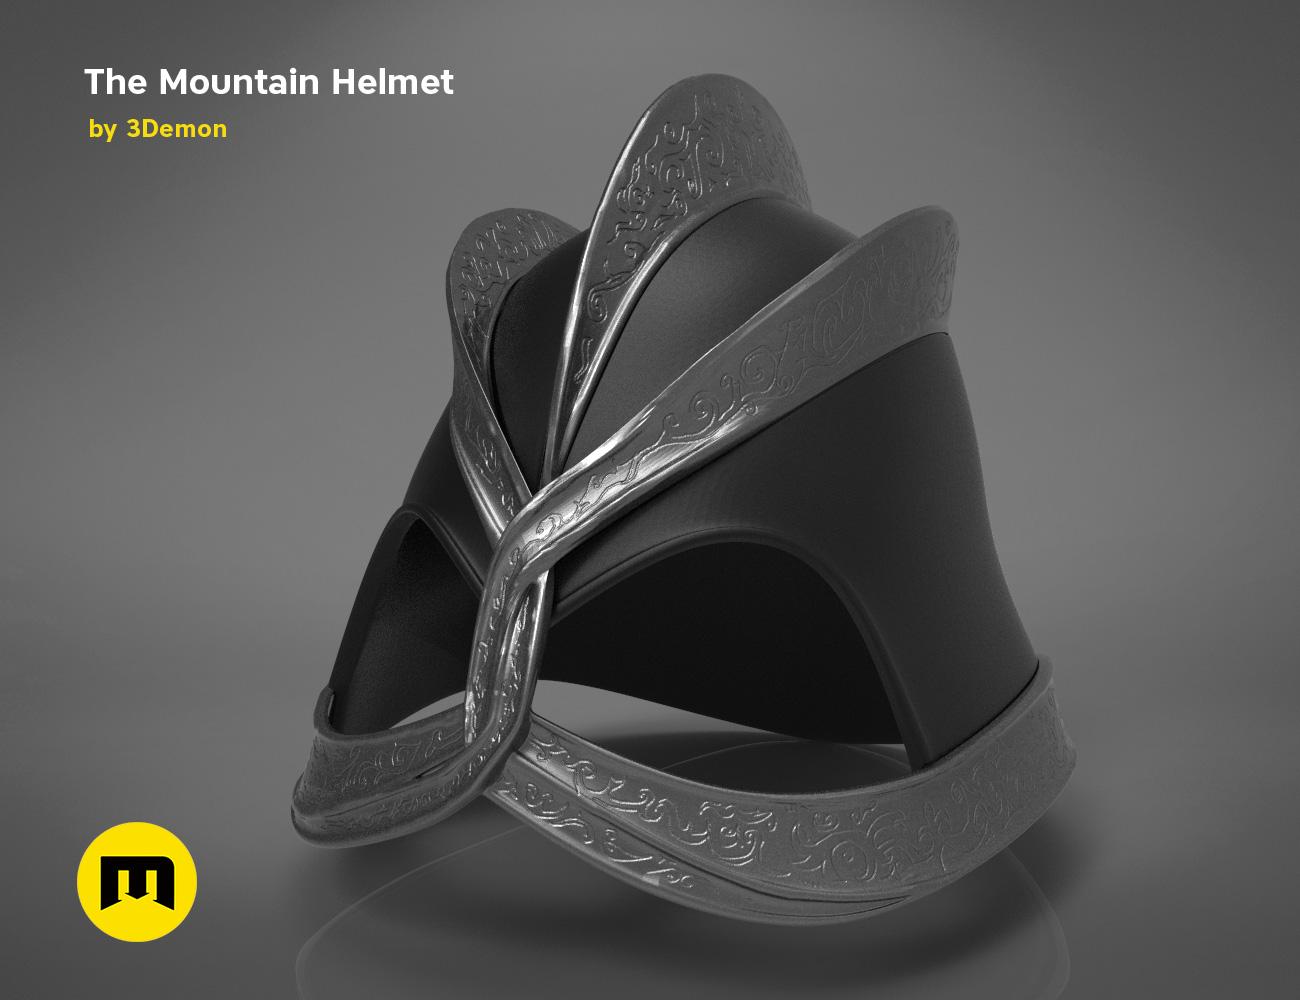 GoT-mountain-helmet-color.645.jpg Download STL file The Mountain Helmet – Game of Thrones • 3D printing model, 3D-mon